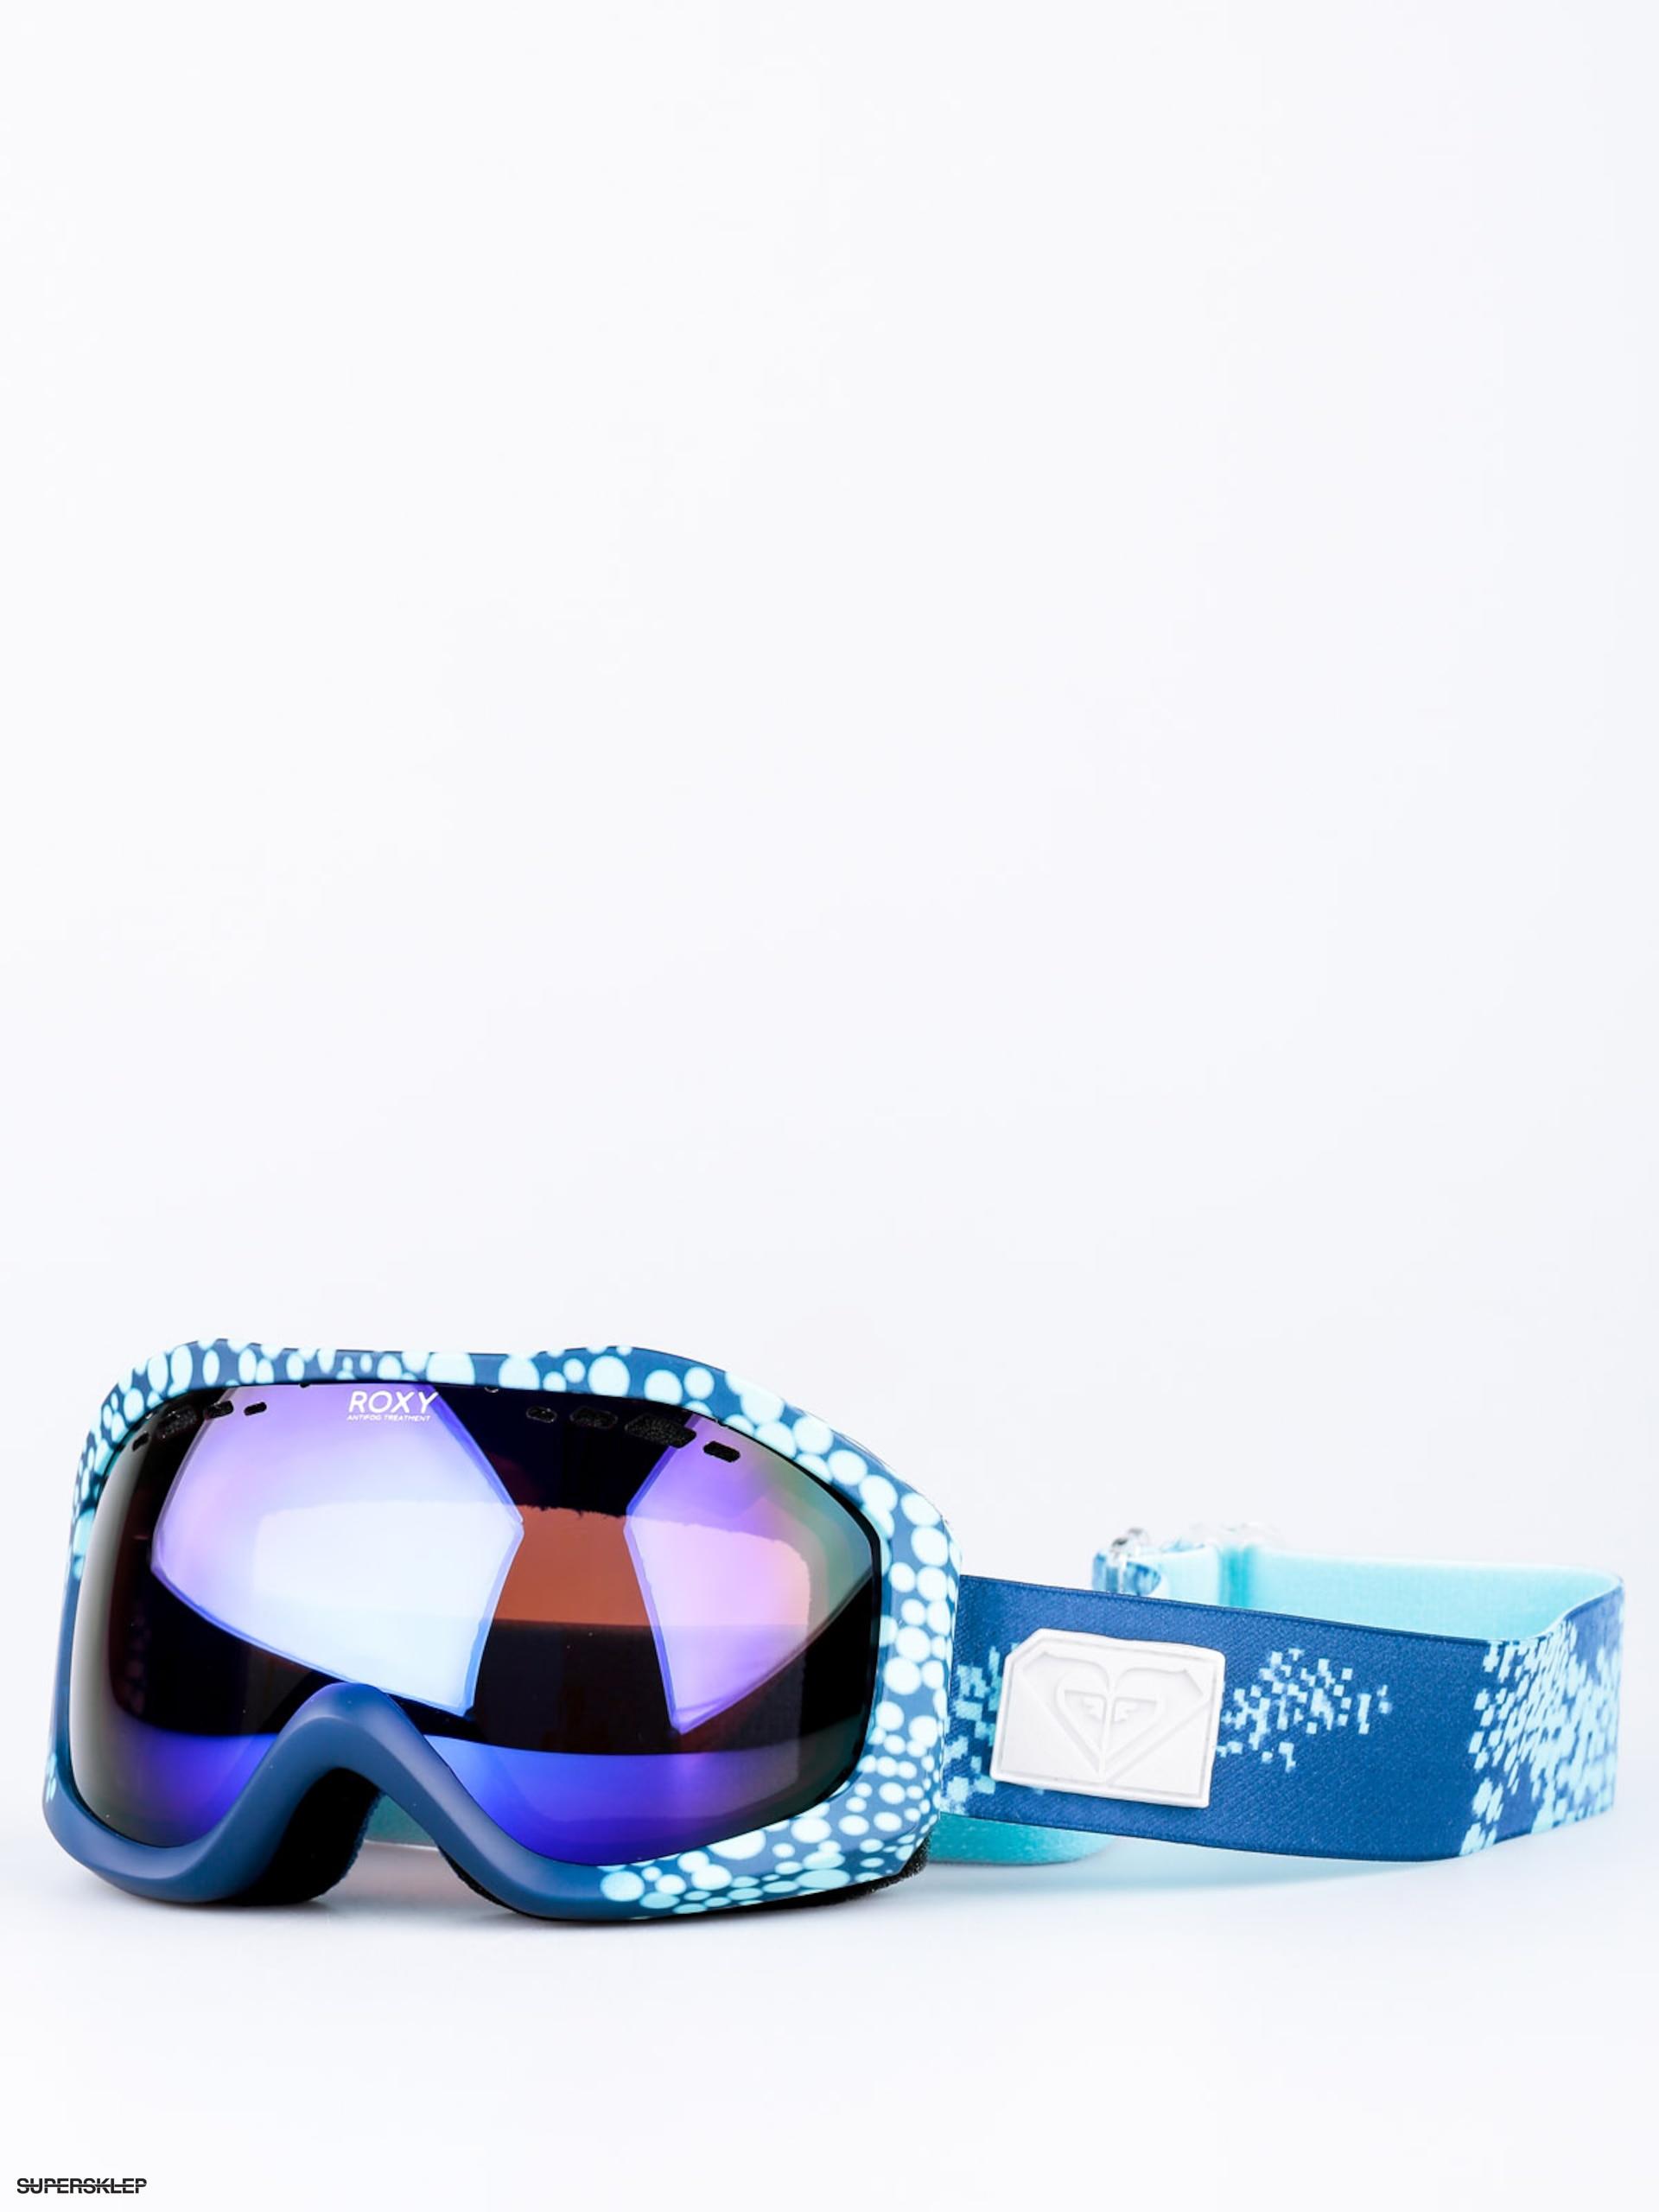 250a0ddcd Okuliare na snowboard Roxy Sunset Art Series Wmn (cloudofdots blue  radiance/amber rose ml blue)